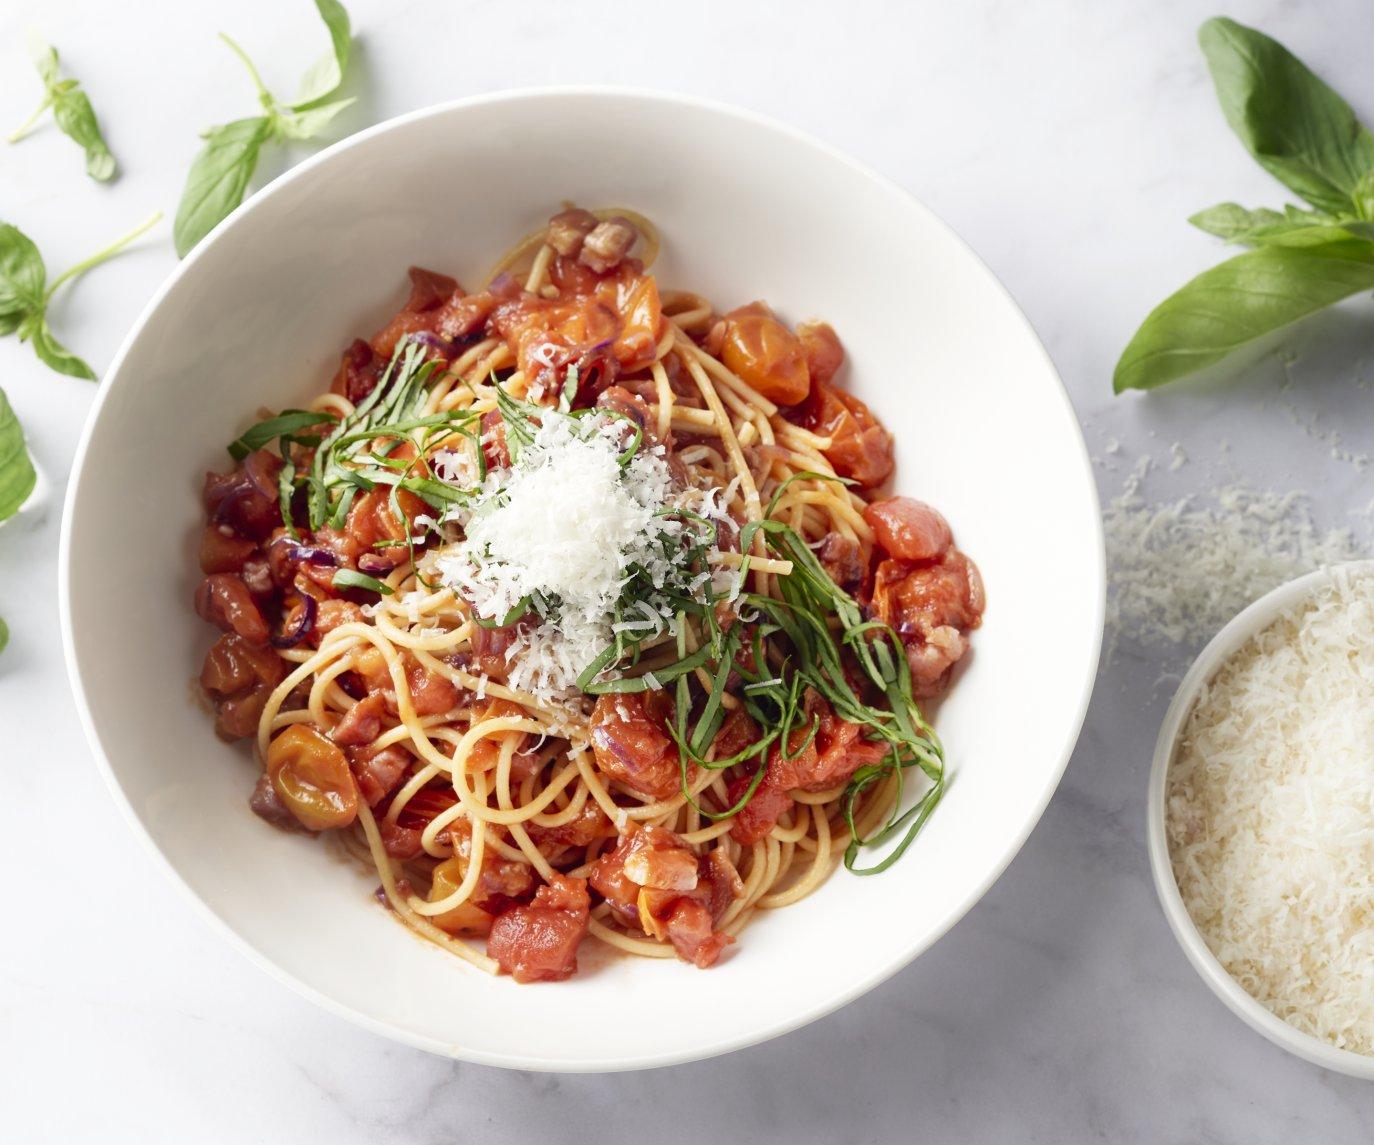 Spaghetti all'Amatriciana